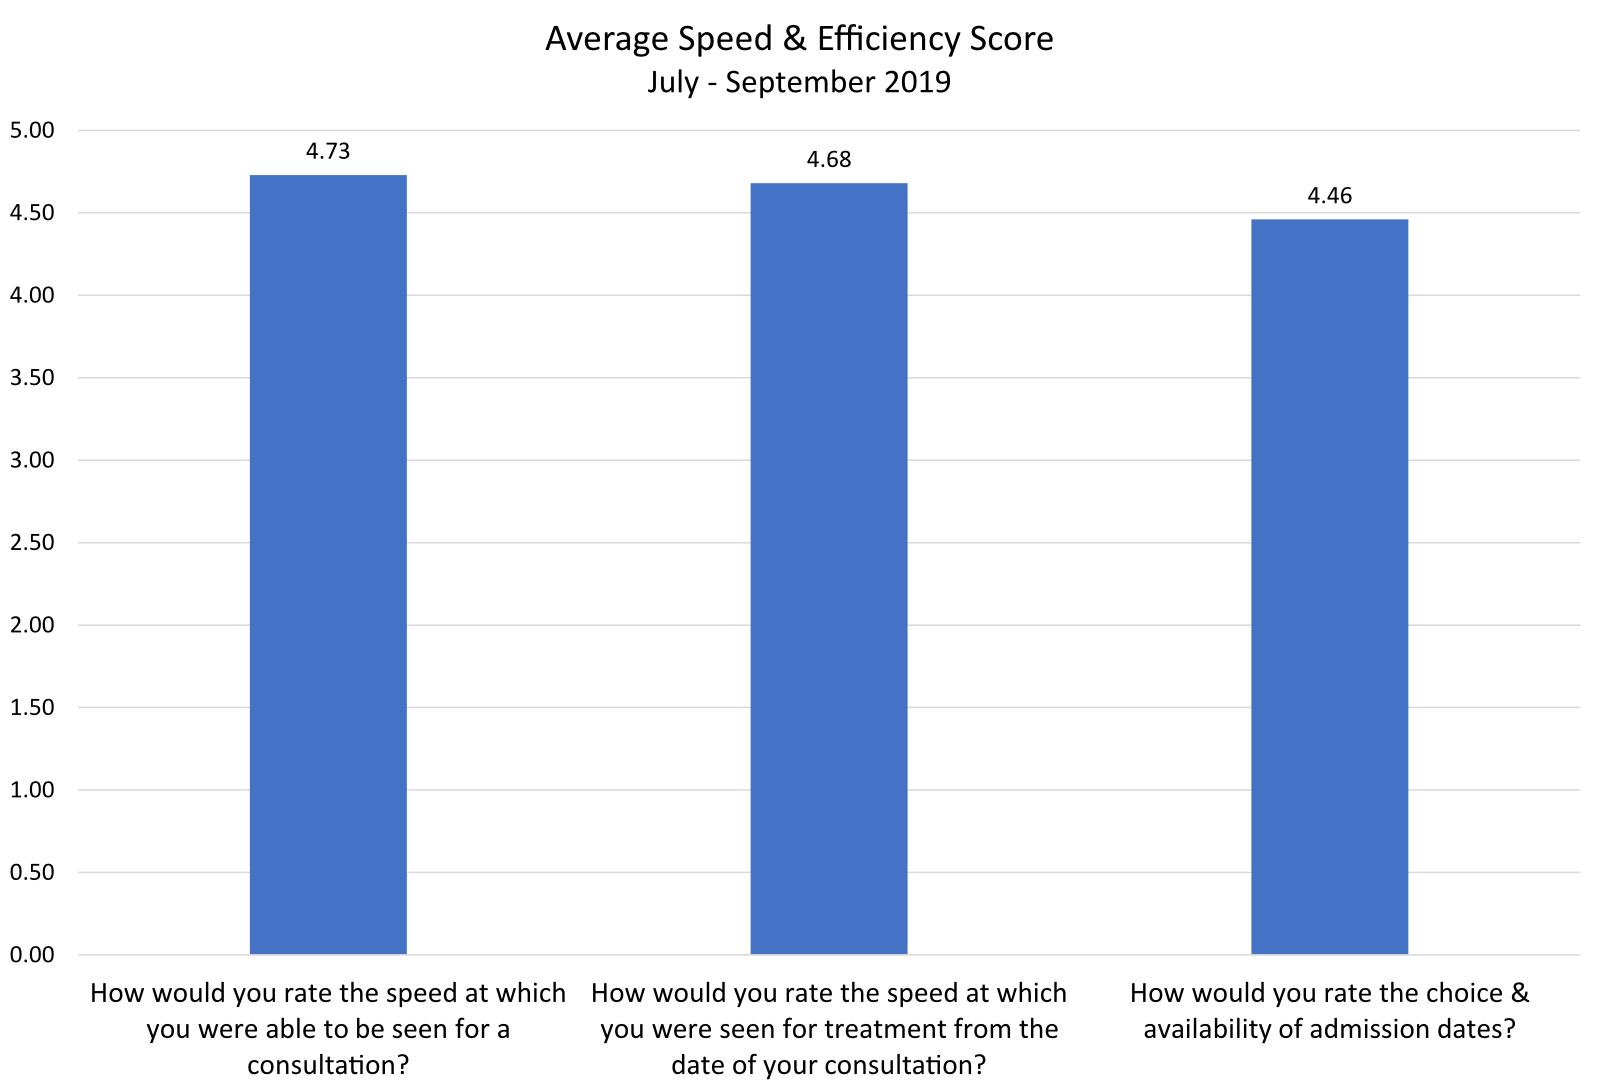 Exeter Eye Patient Feedback Average Speed & Efficiency July - Sept 2019